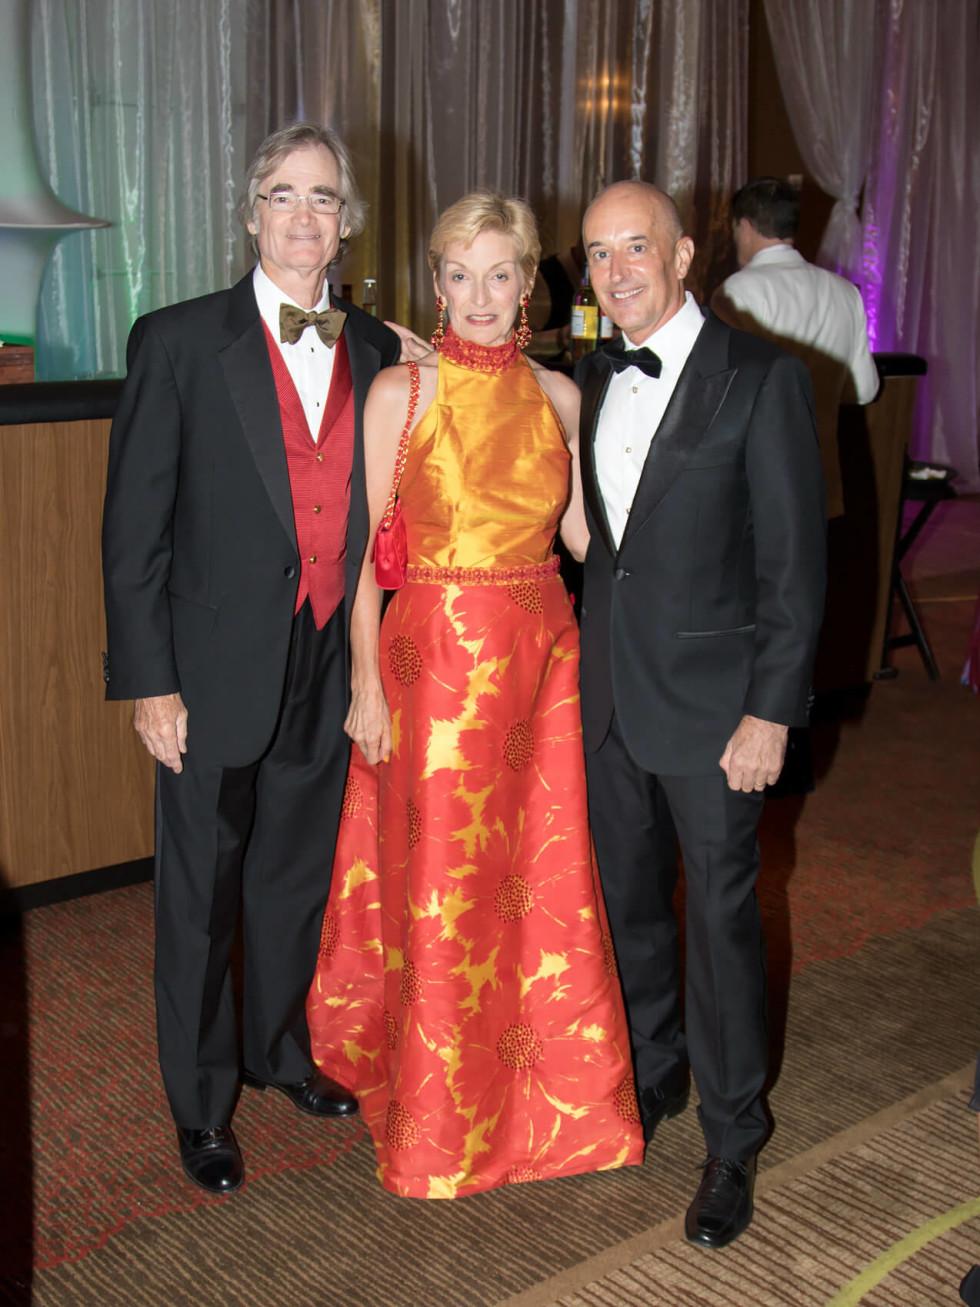 Steve Turman, Maggie McQuown, Steven Rayl